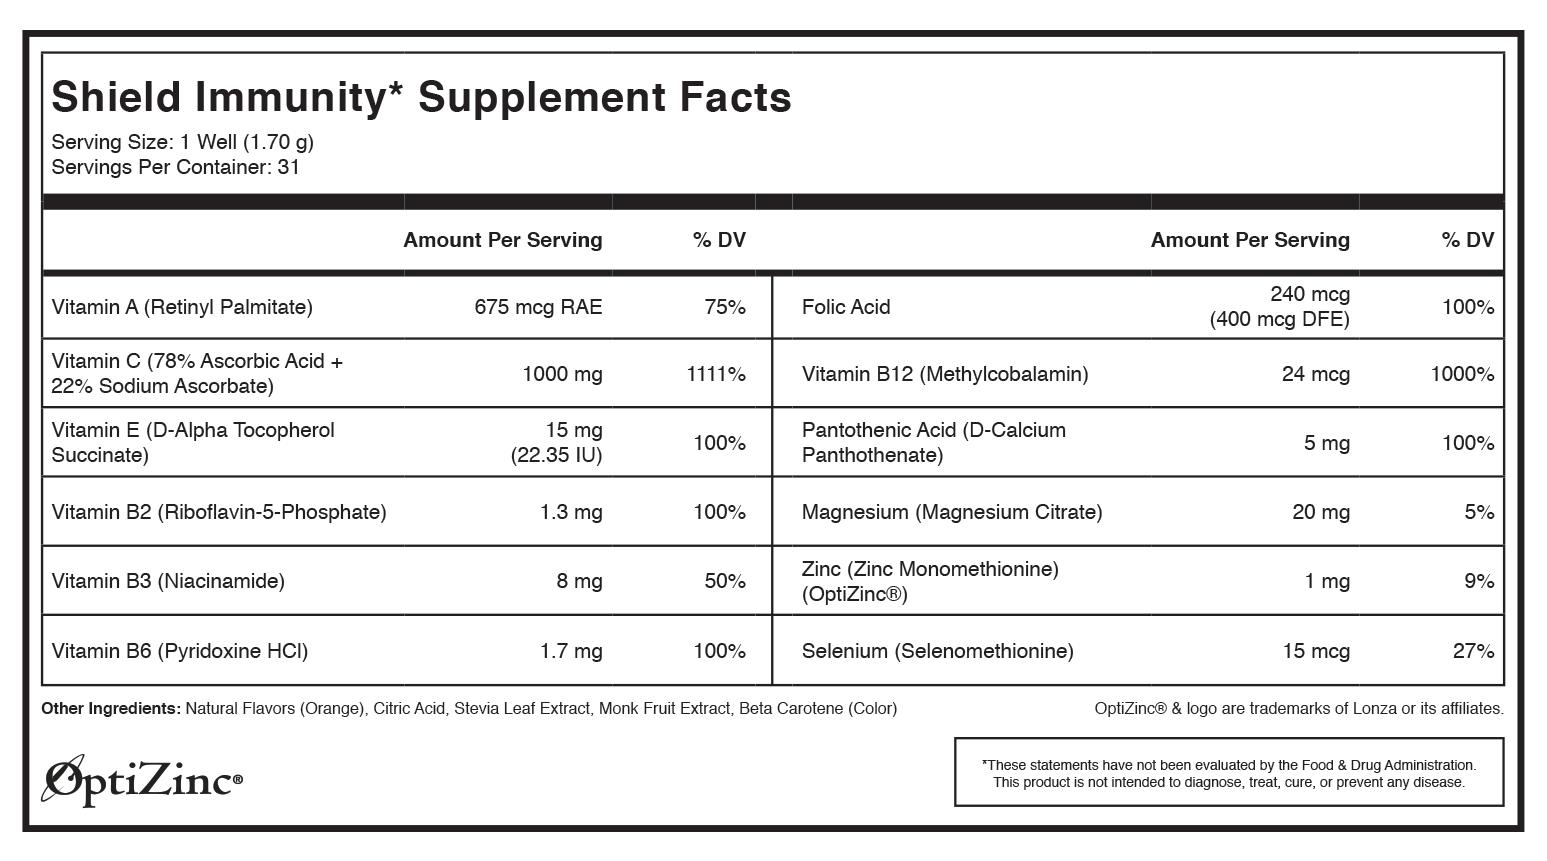 Tespo® Shield Immunity* nutrition label